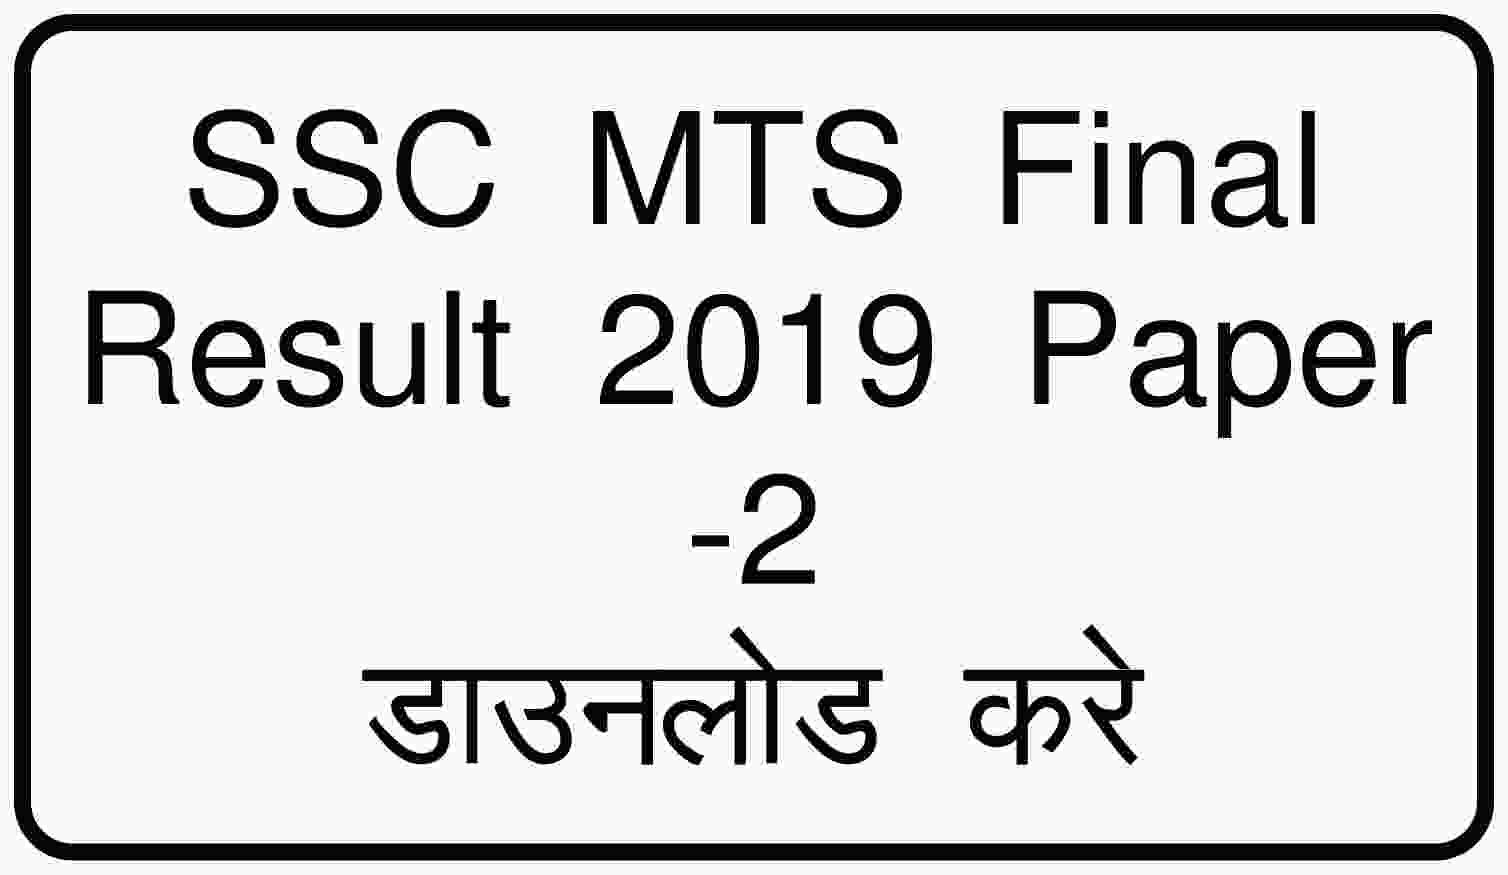 ssc mts final results 2019